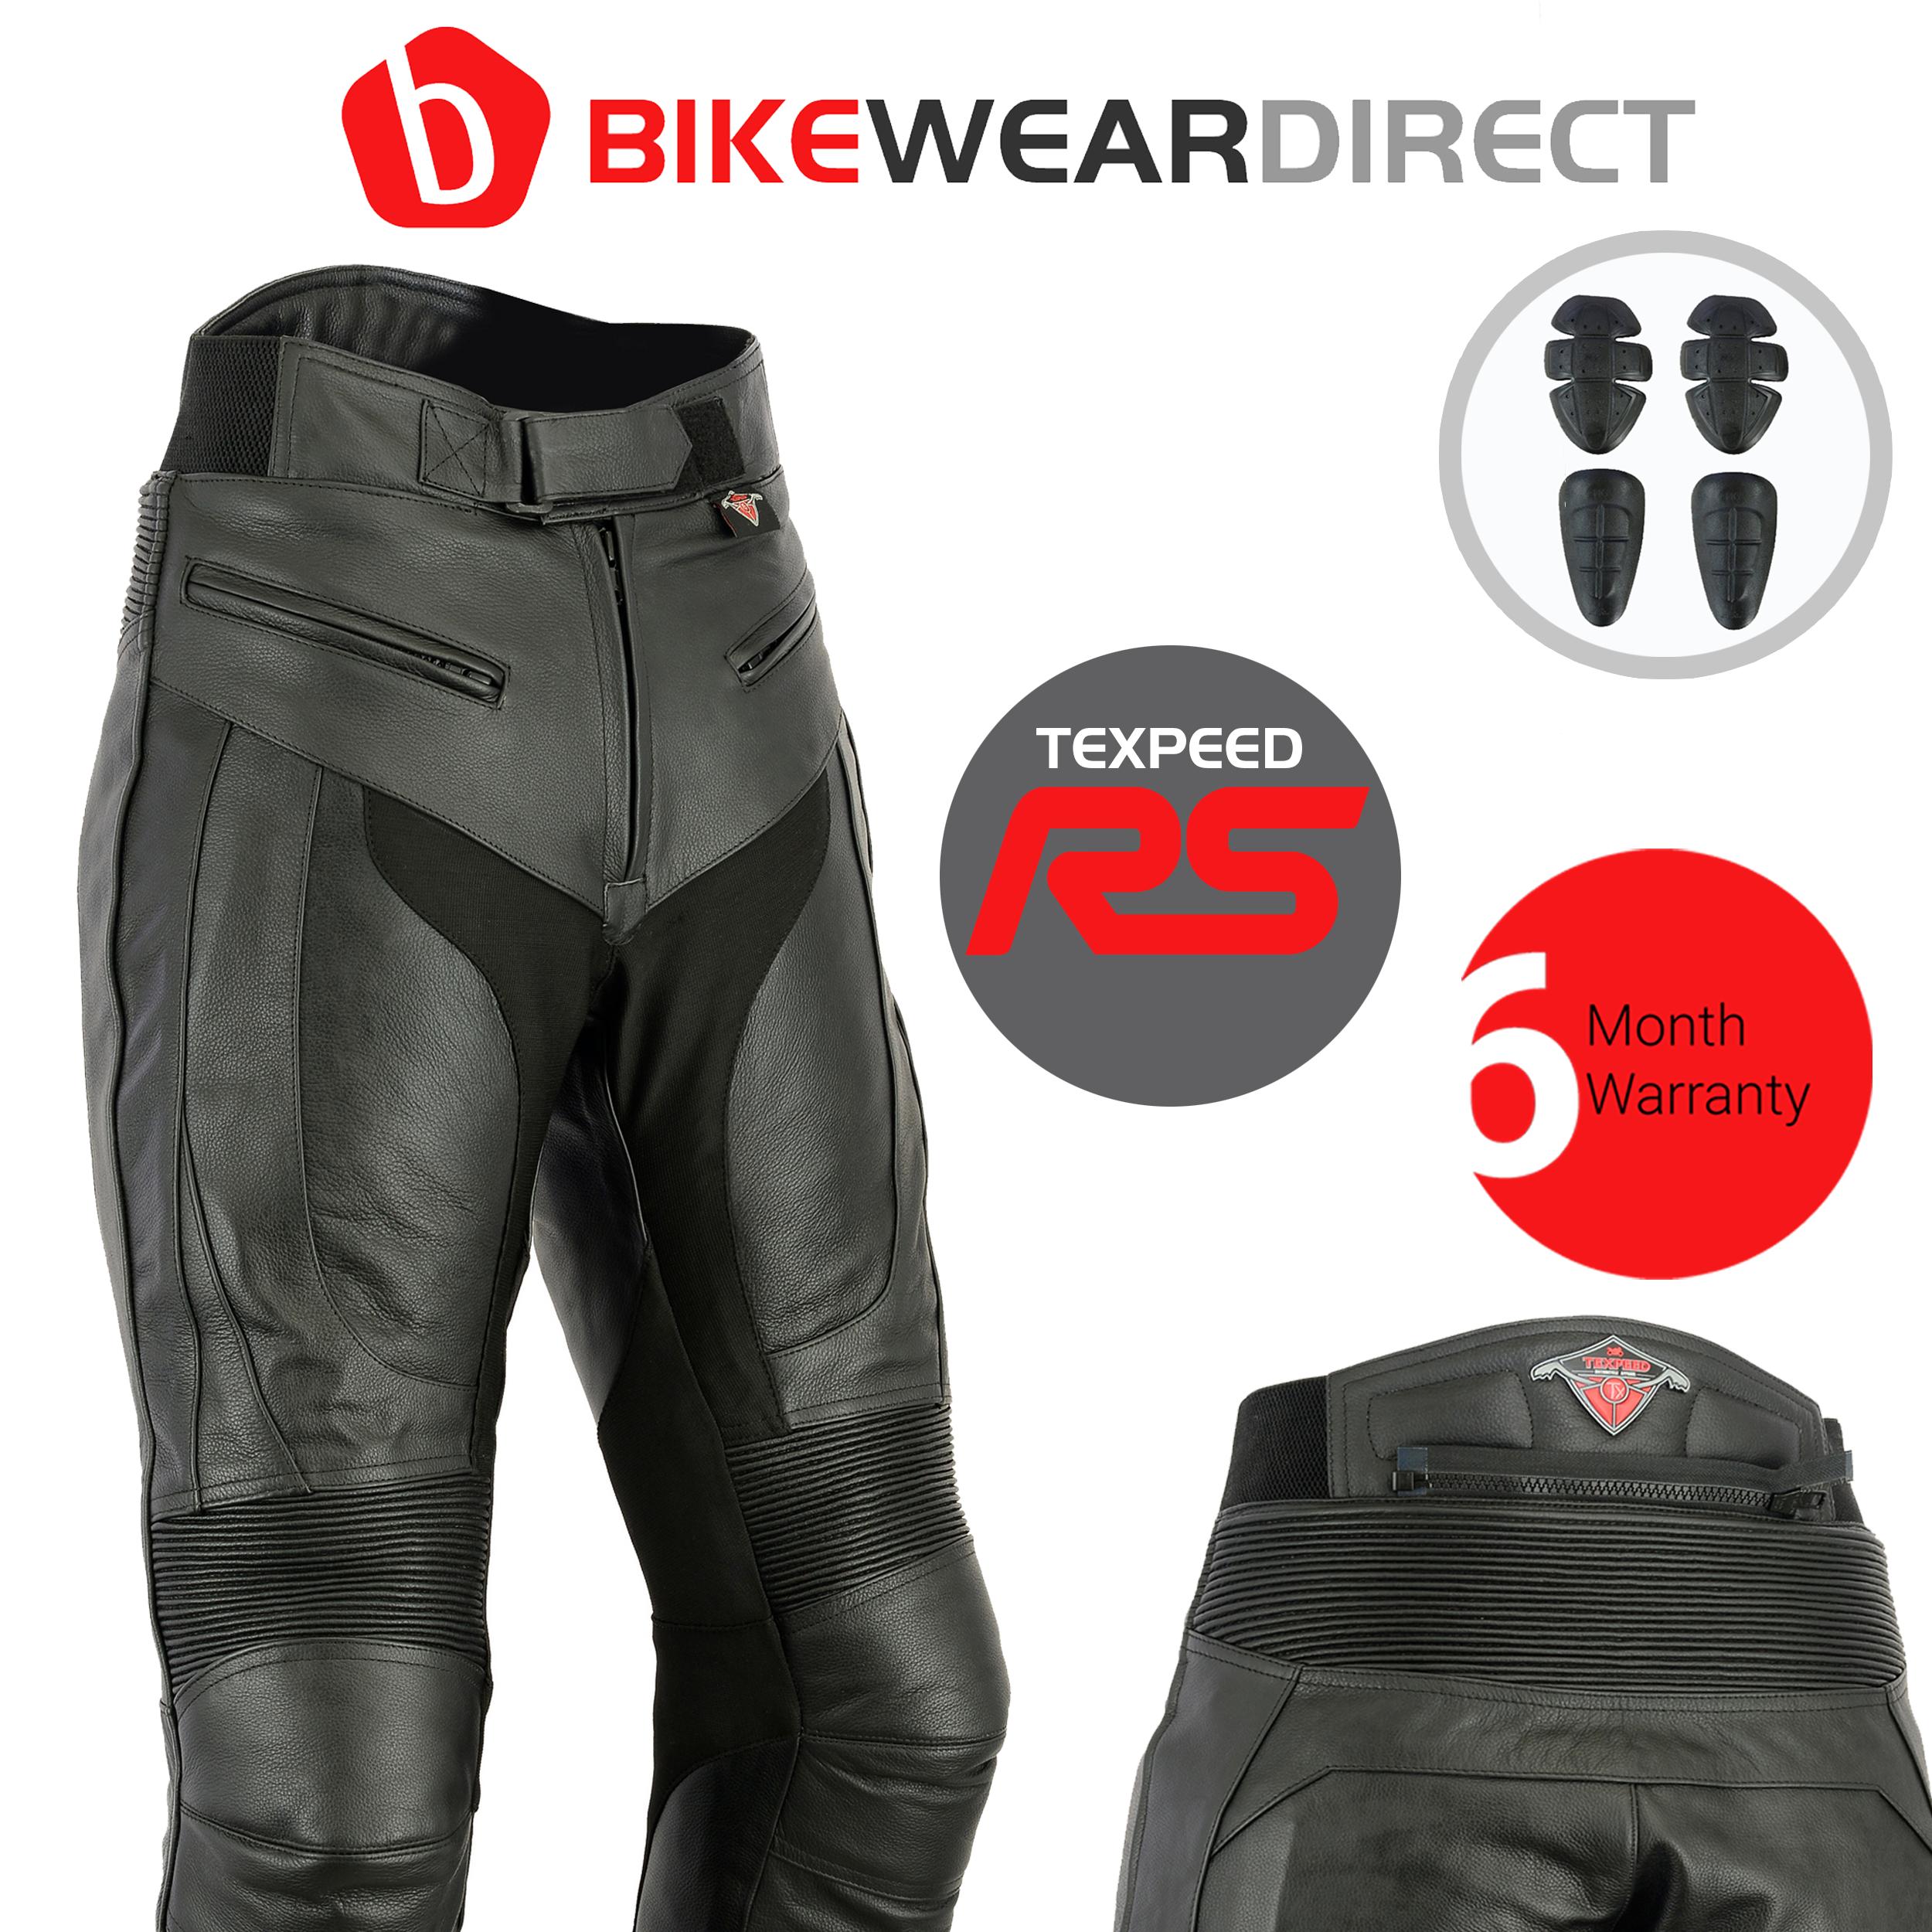 c0053474560d40 SENTINEL Pantaloni da motocicletta da moto in pelle Pantaloni da  motociclista sportivi da corsa da uomo